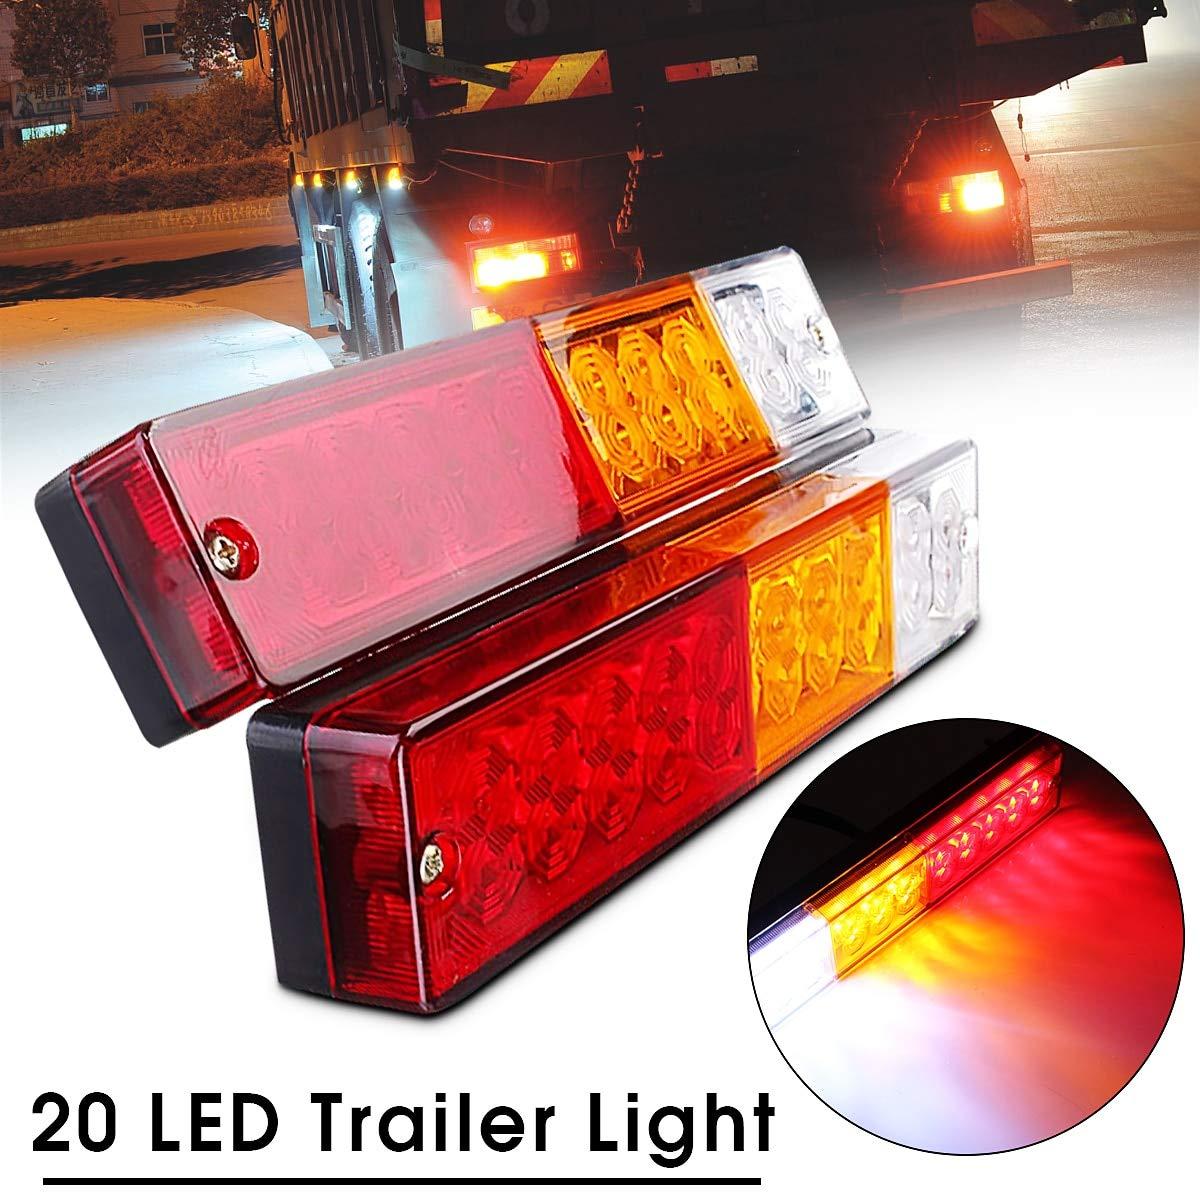 2pcs Truck Trailer Light 12V 20LED High Brightness Rear Lamp Turning Signal Indicator Light LED Brake Trailer Rear Lights